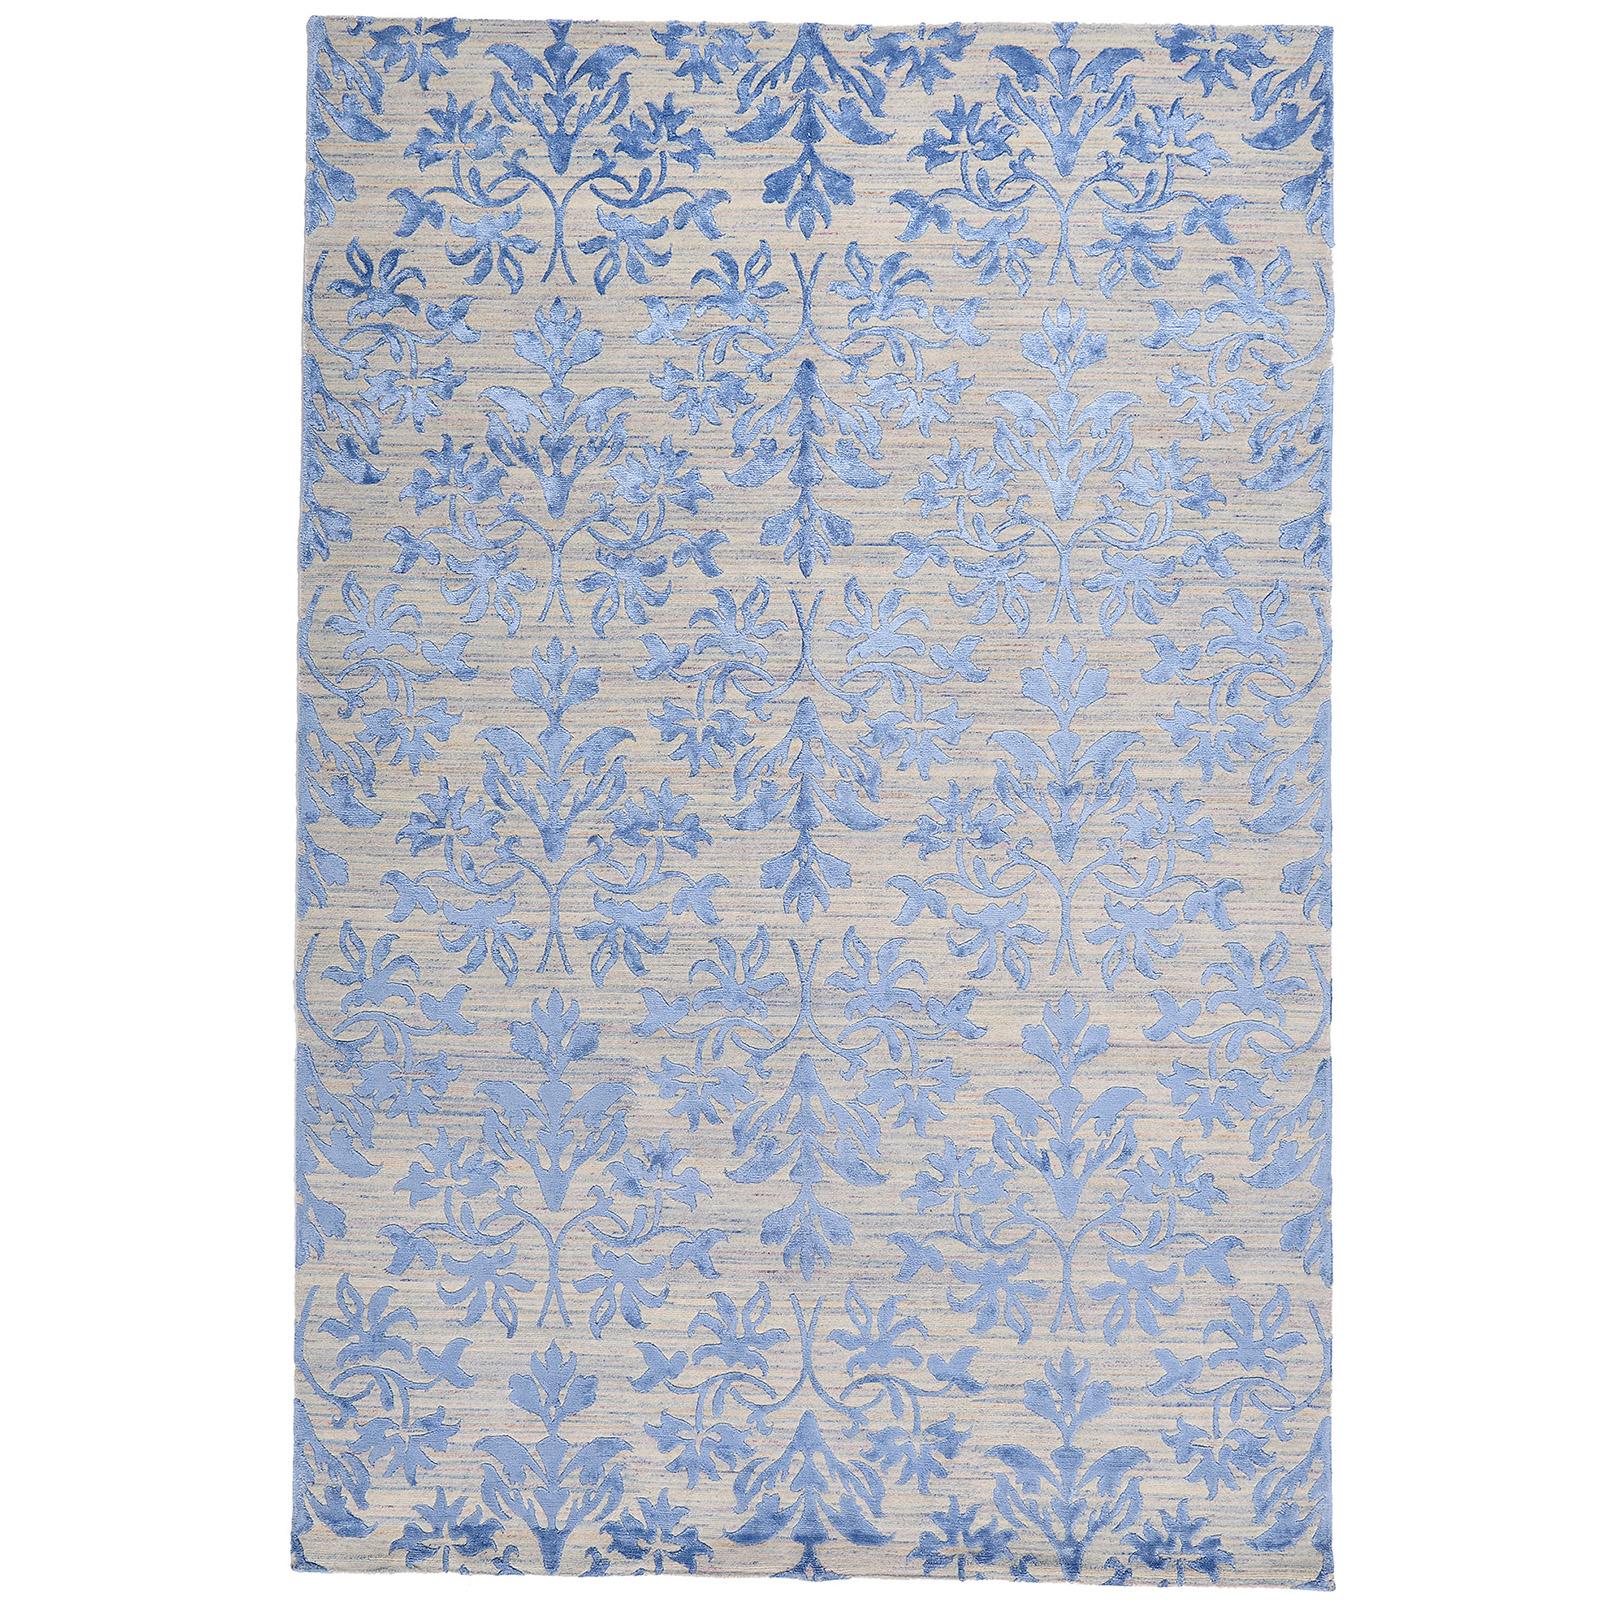 Damask (lilja blå) matta storlek 300x200 cm